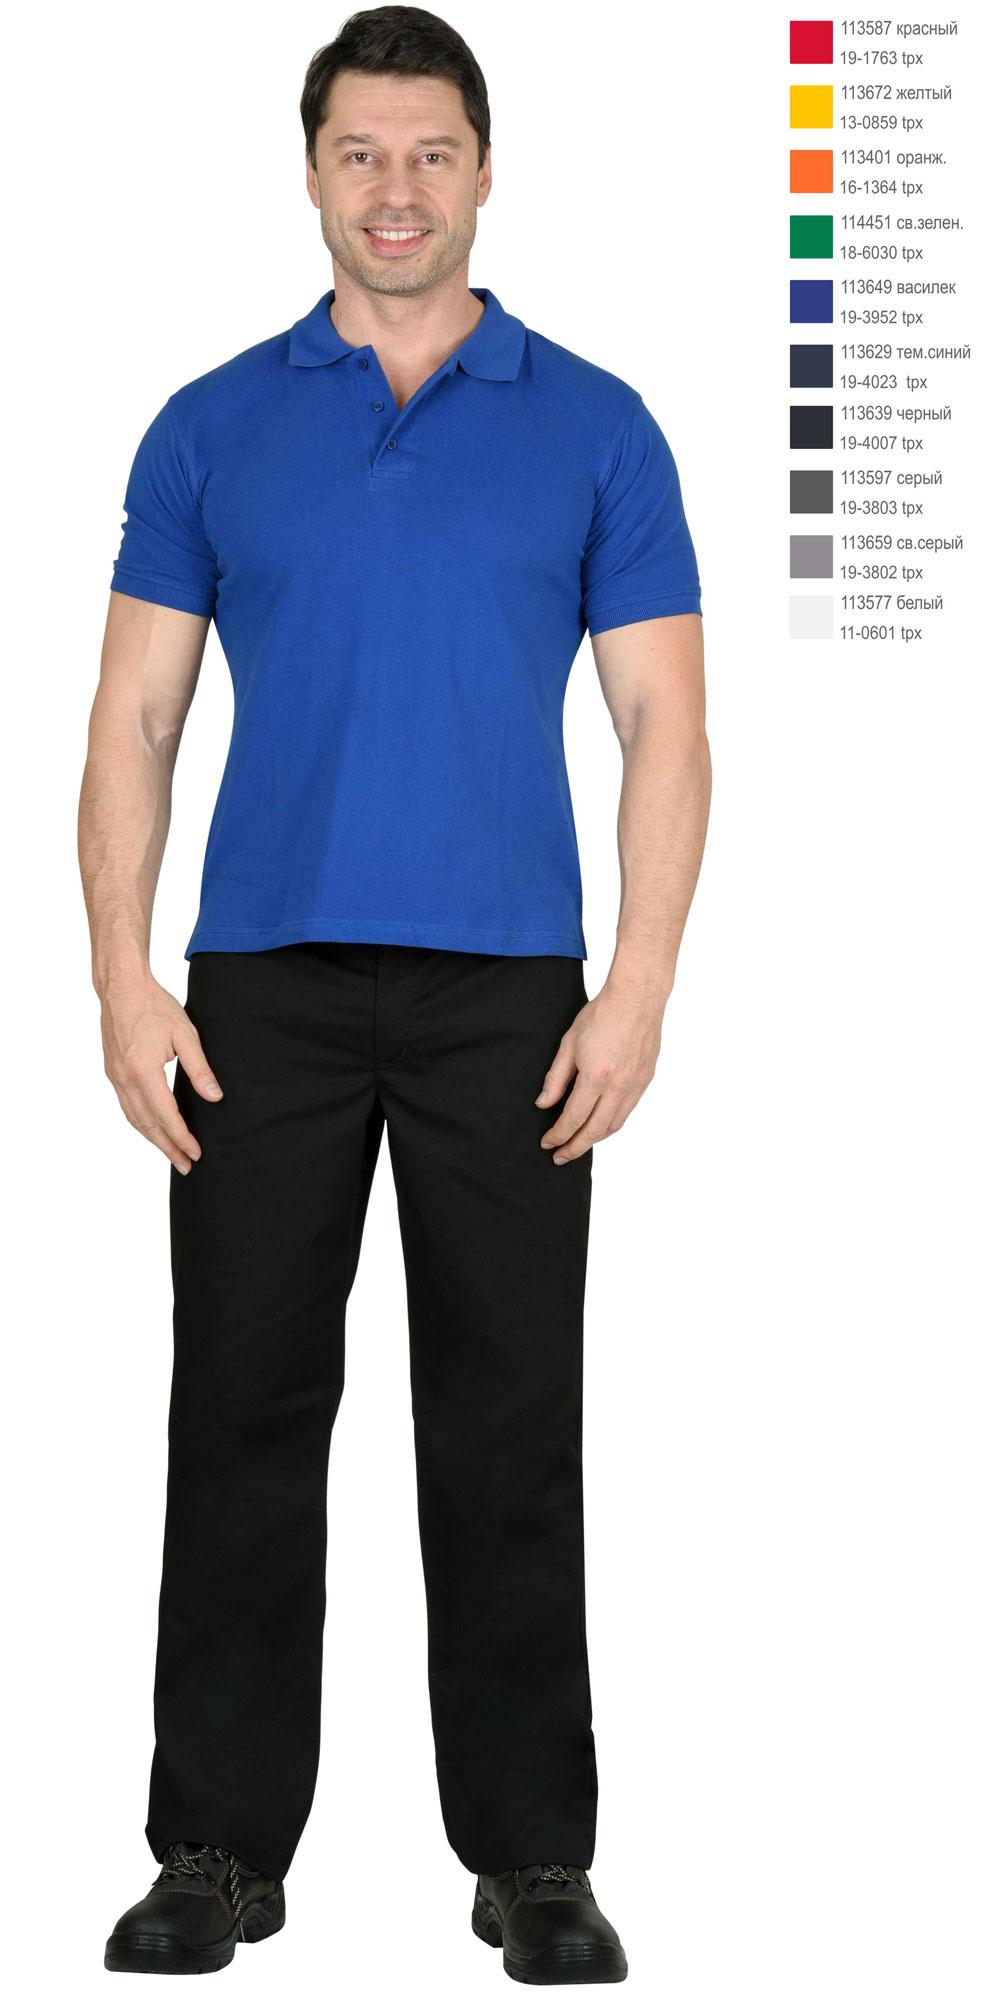 Рубашка-поло ЦЕНА: 640.00